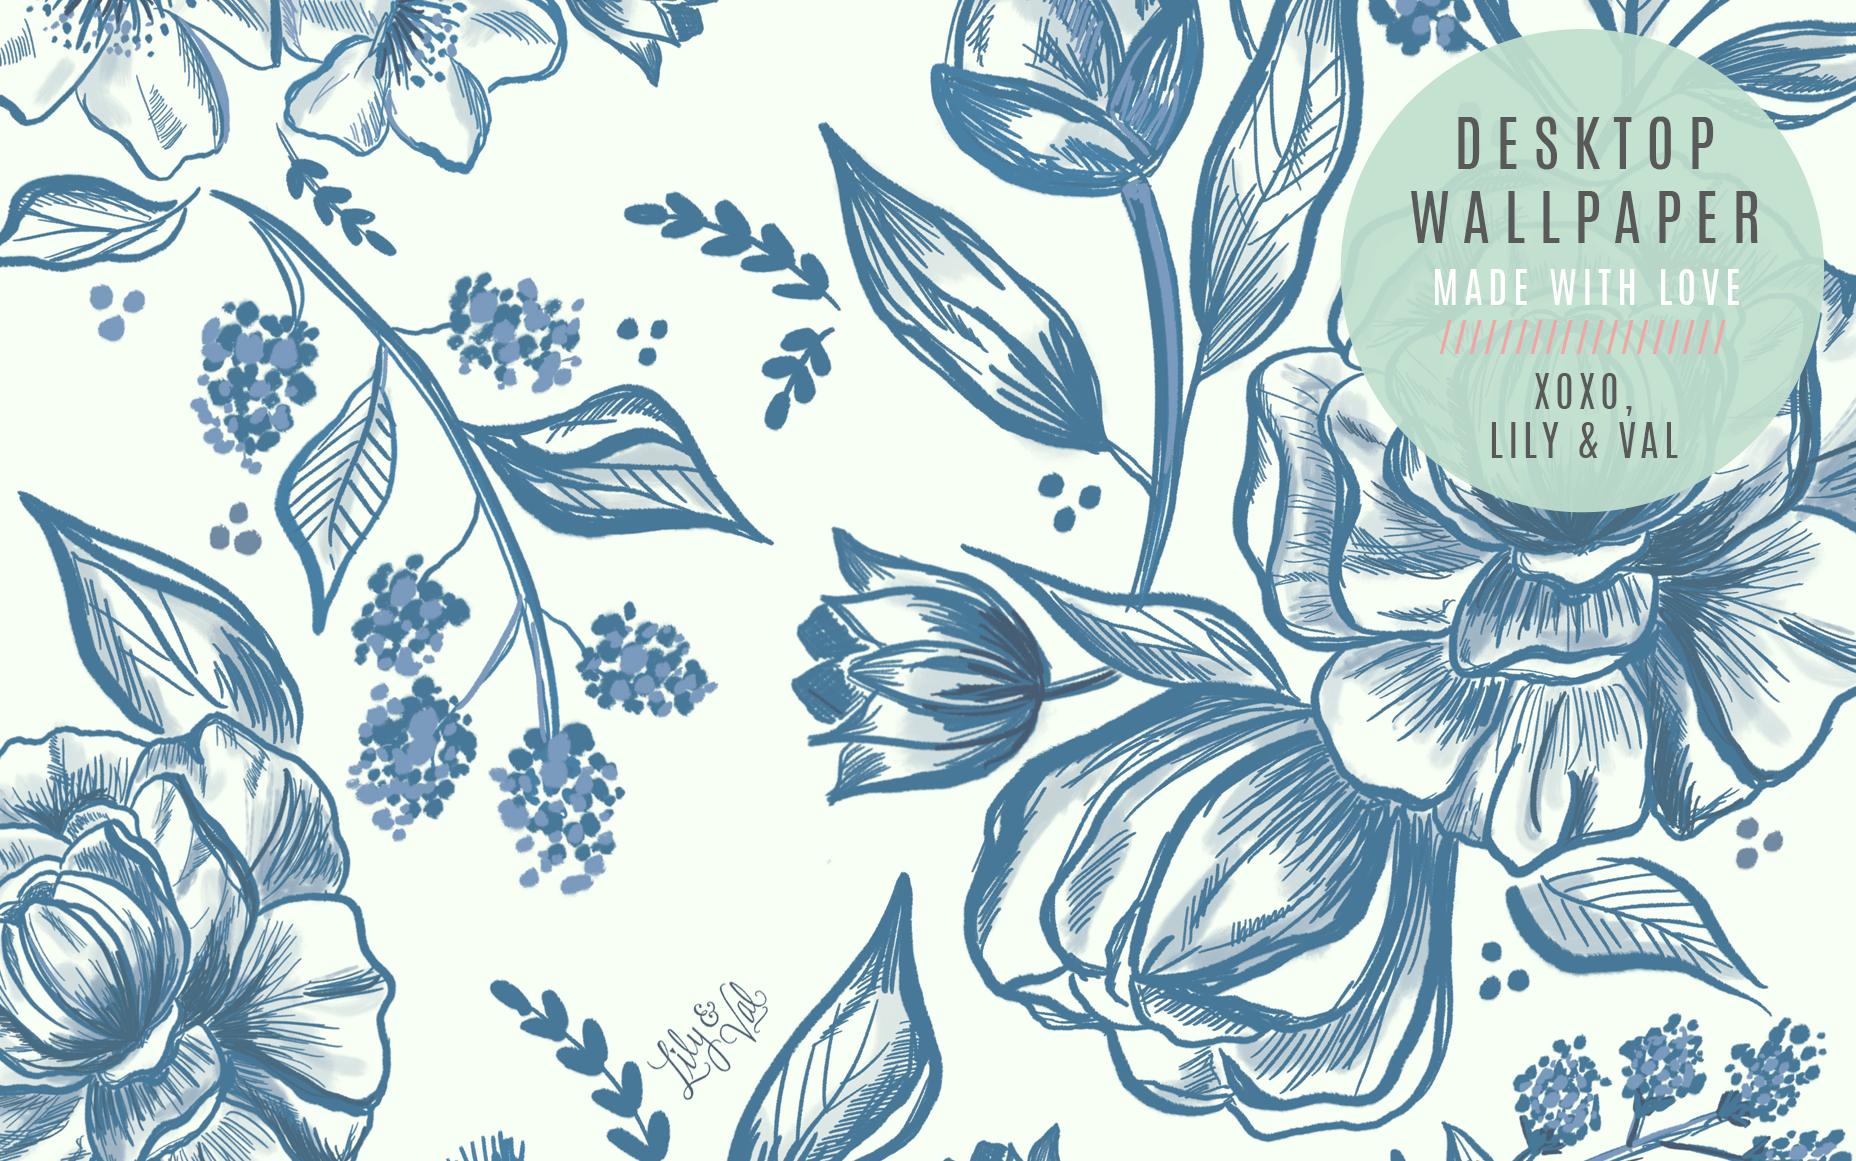 August S Blue Floral Free Desktop Wallpaper Download Lily Val Living Free Desktop Wallpaper Backgrounds Desktop Wallpaper Summer Free Desktop Wallpaper